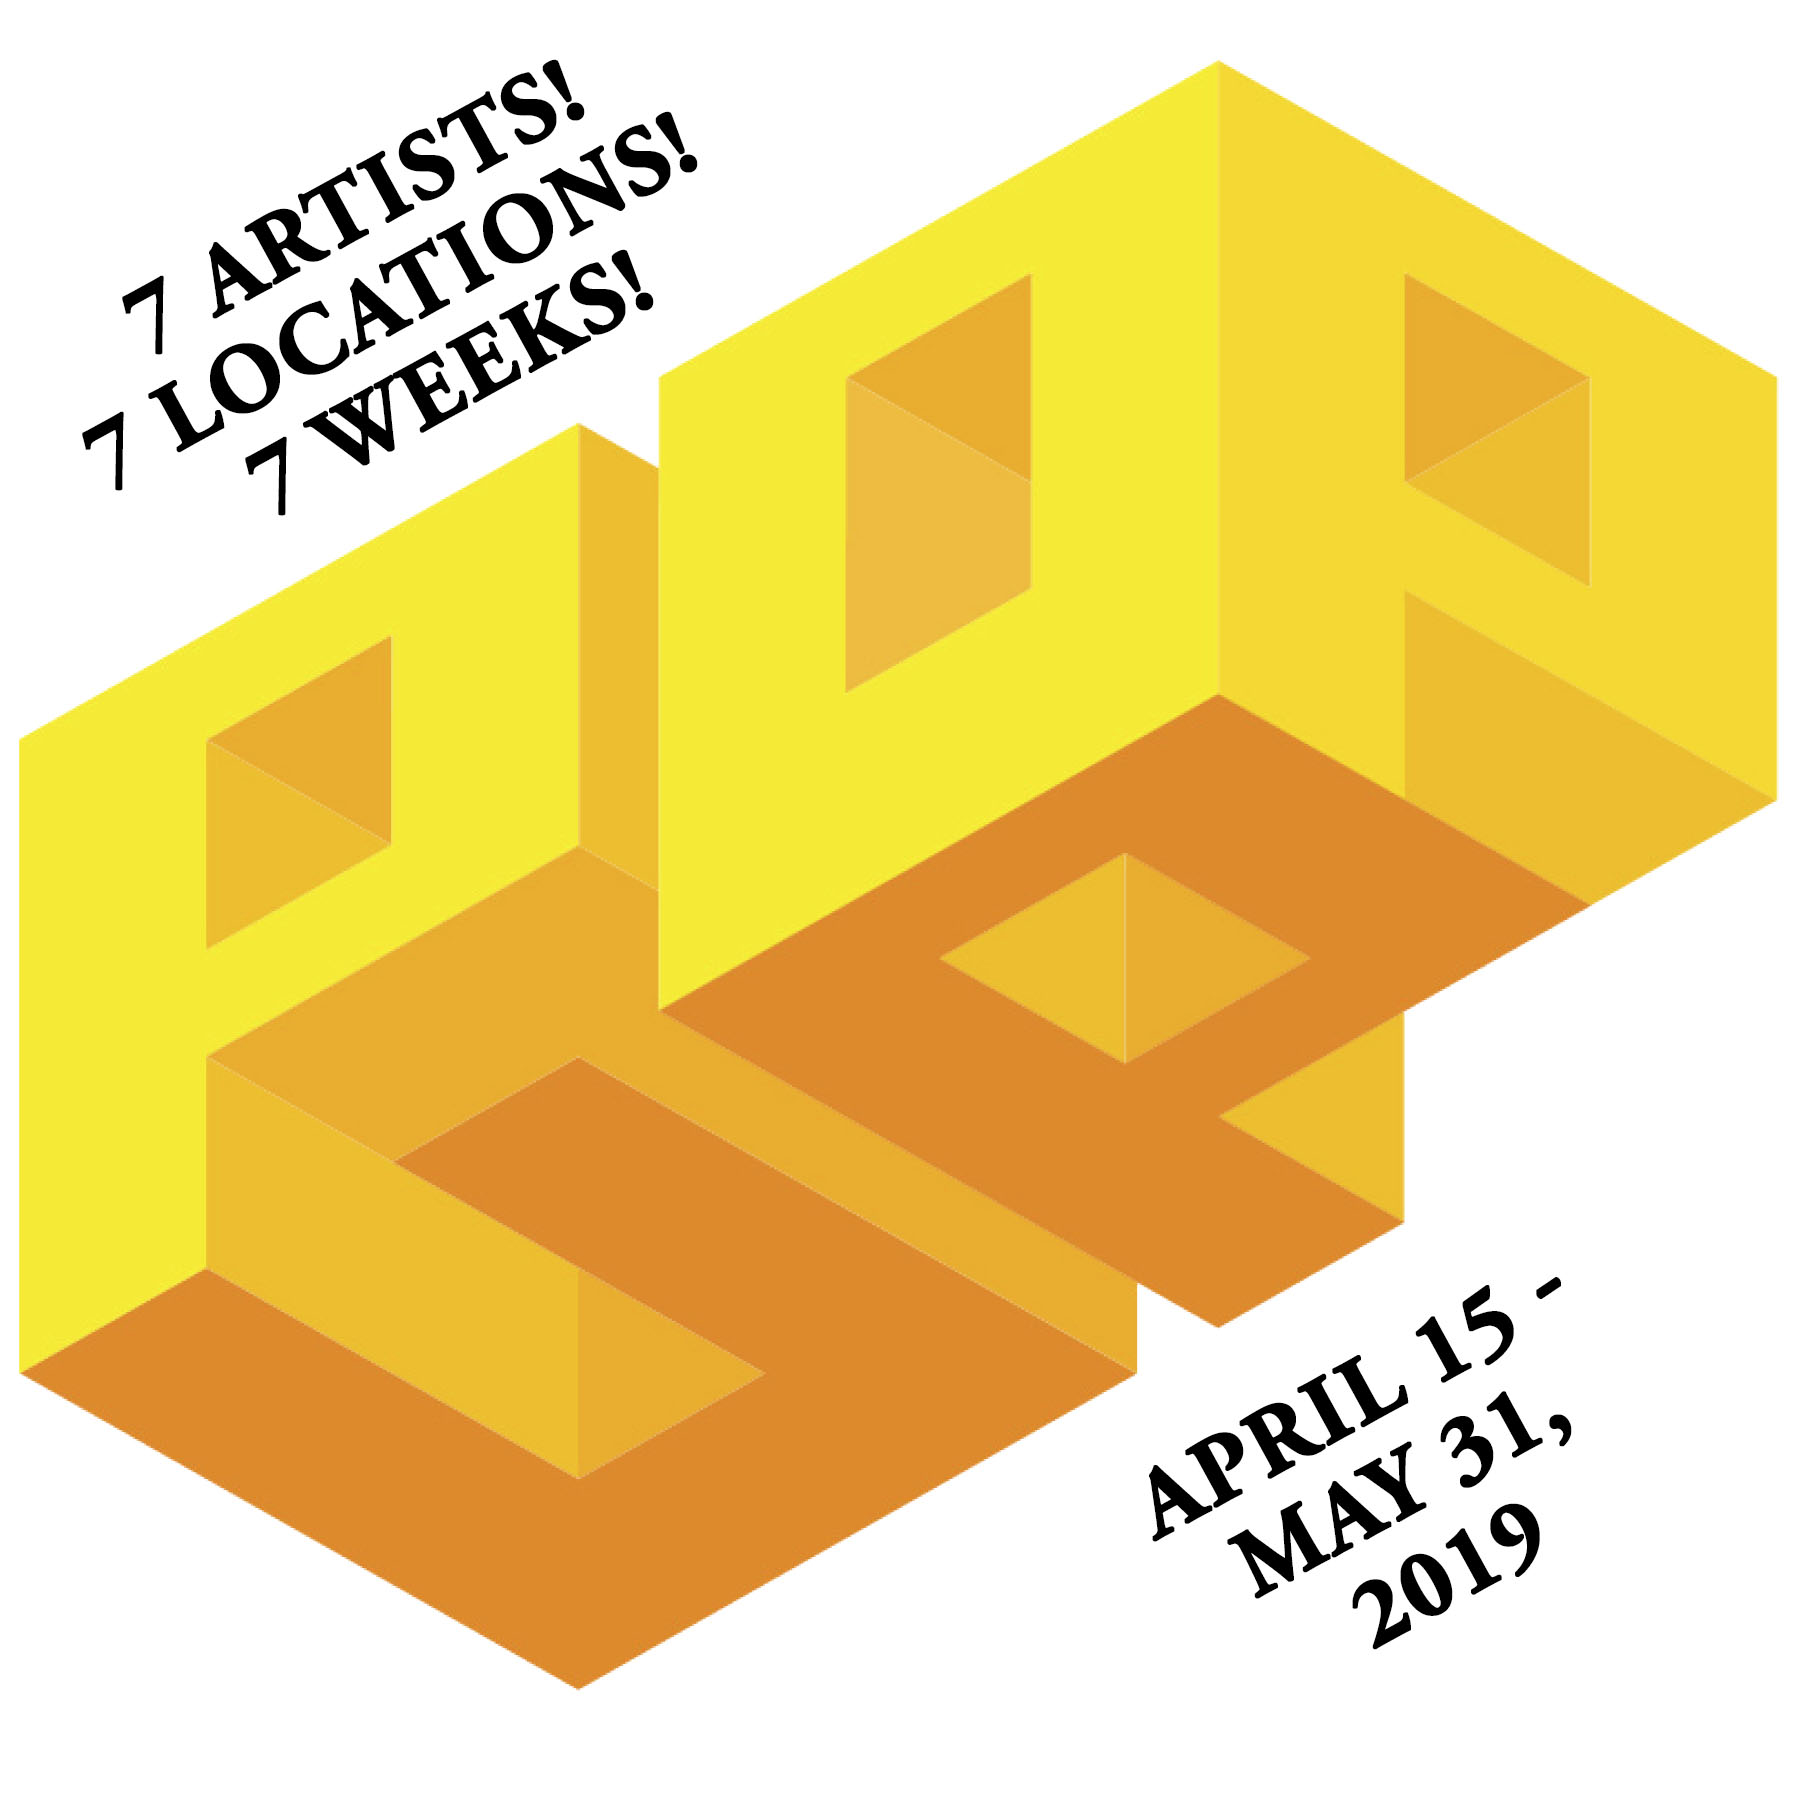 Pop-Up Galleries! 7 Artists 7 Locations 7 Weeks!